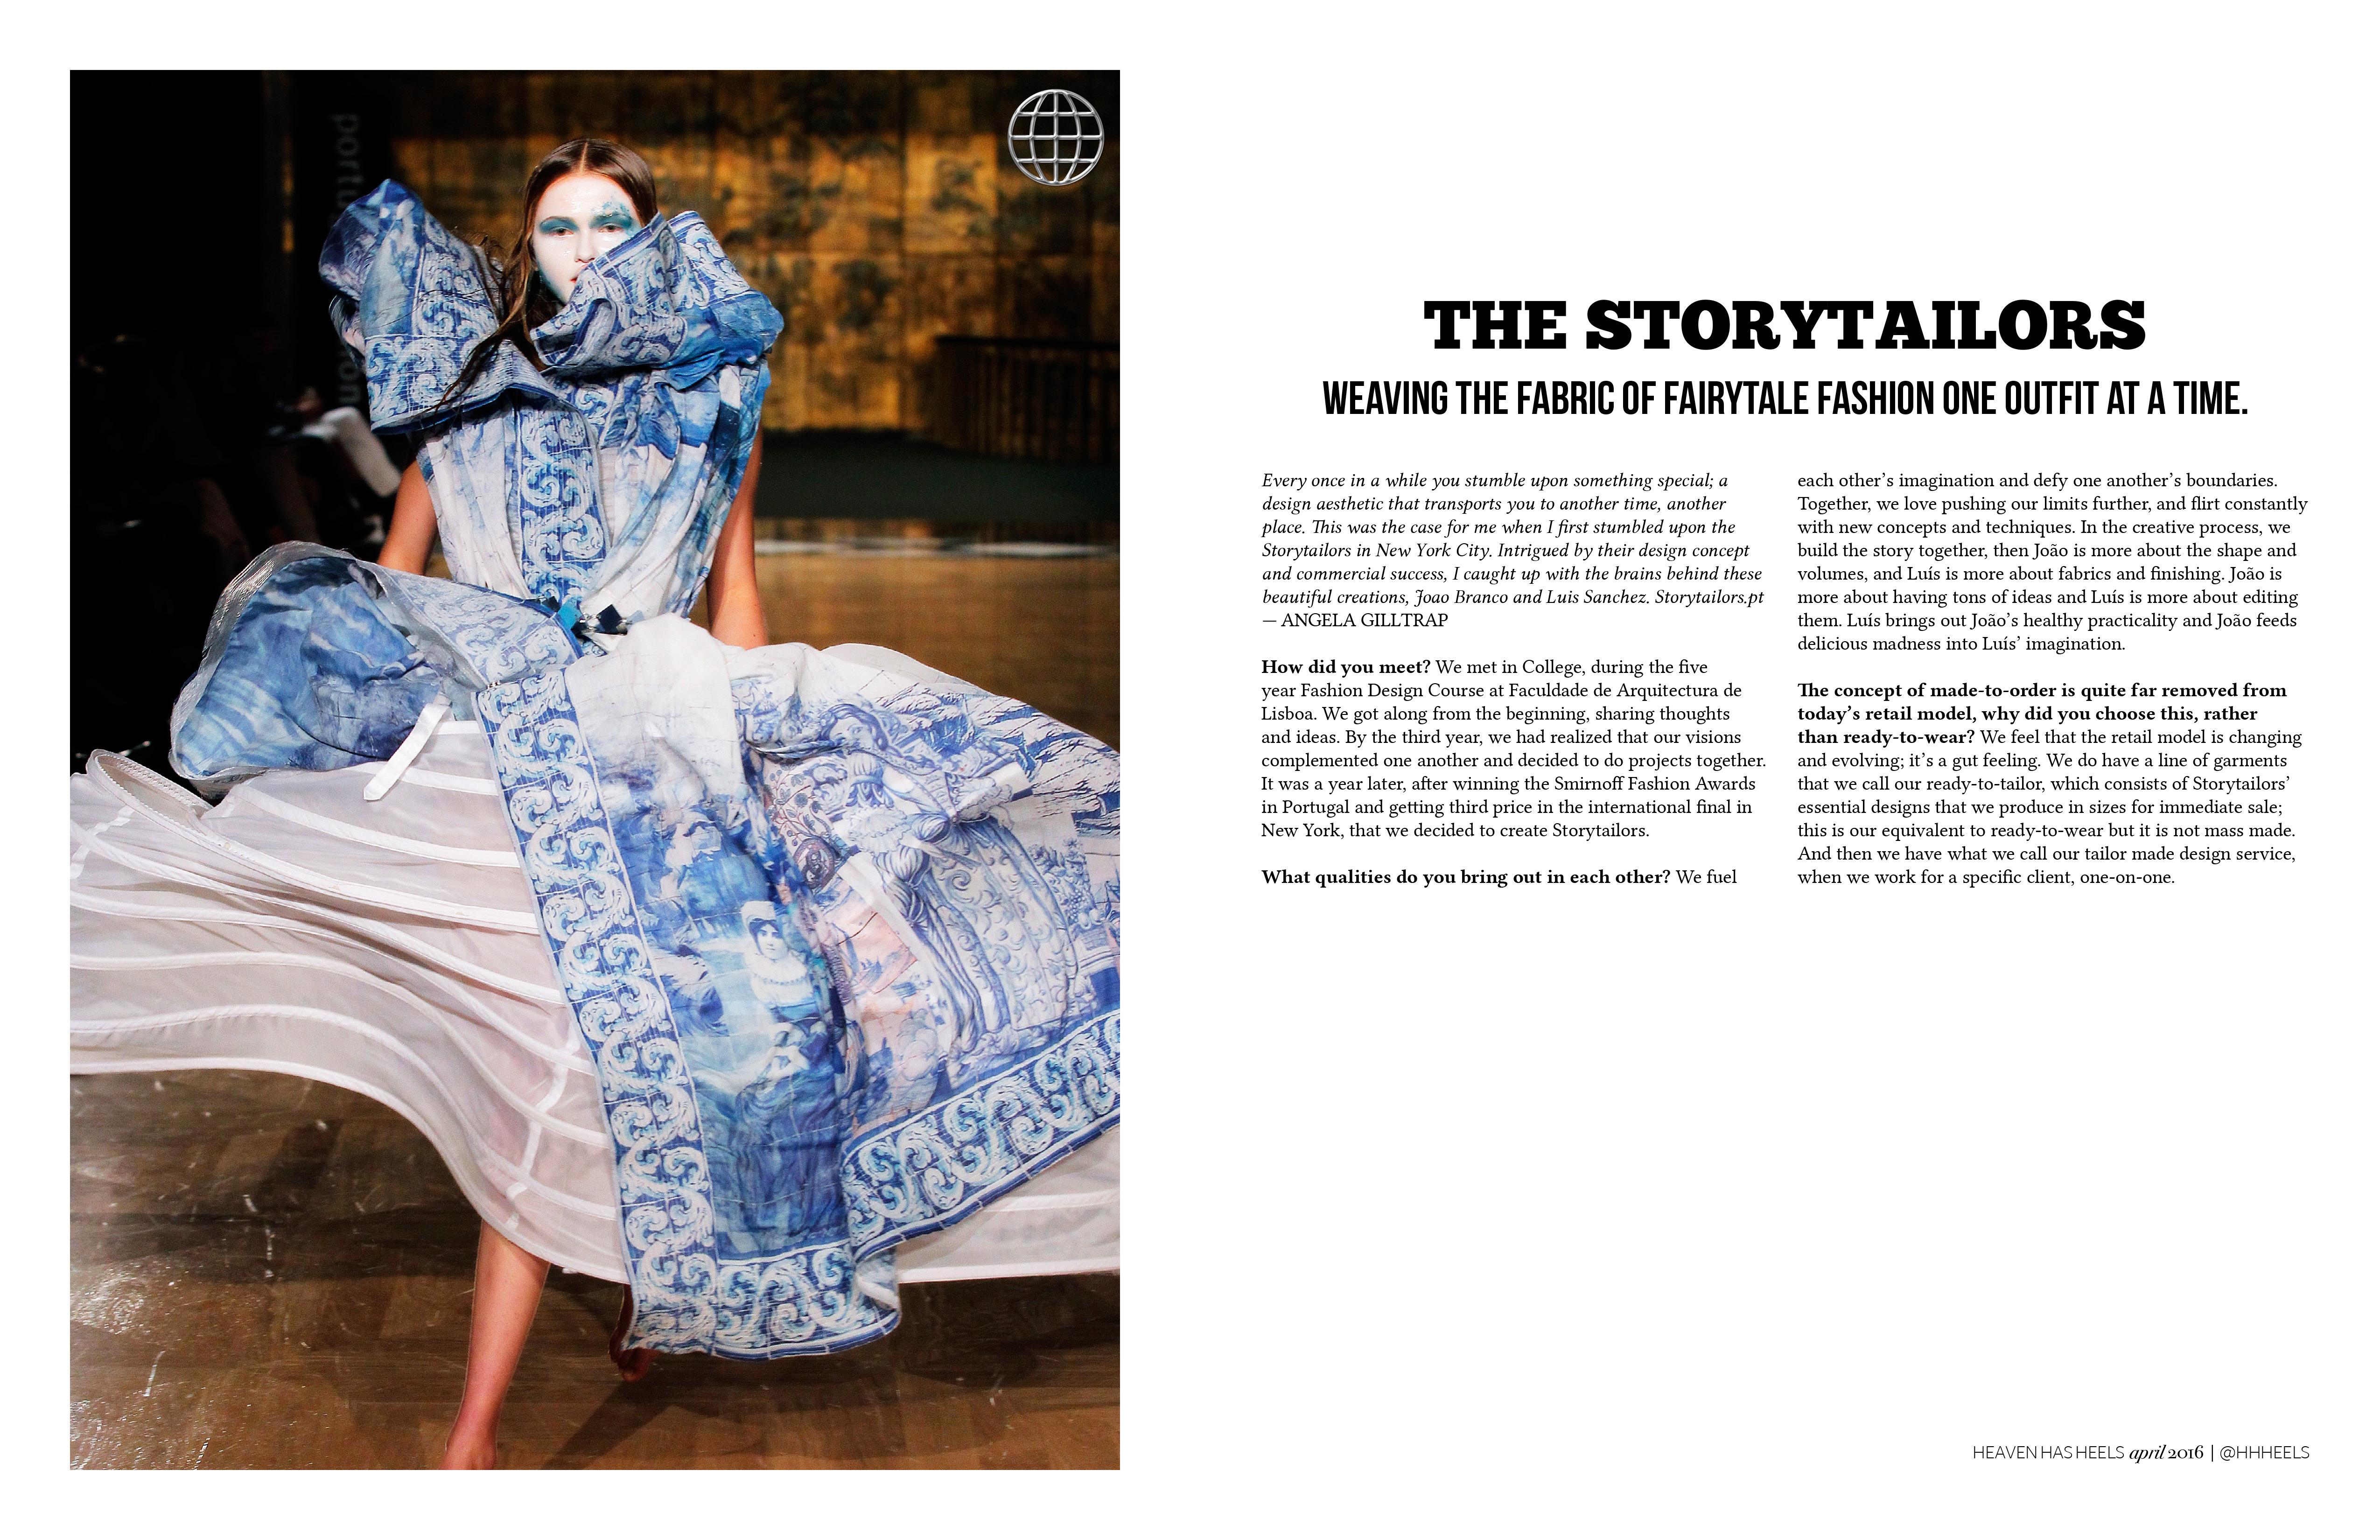 Heaven-Has-Heels-April-Issue-Storytailors-1